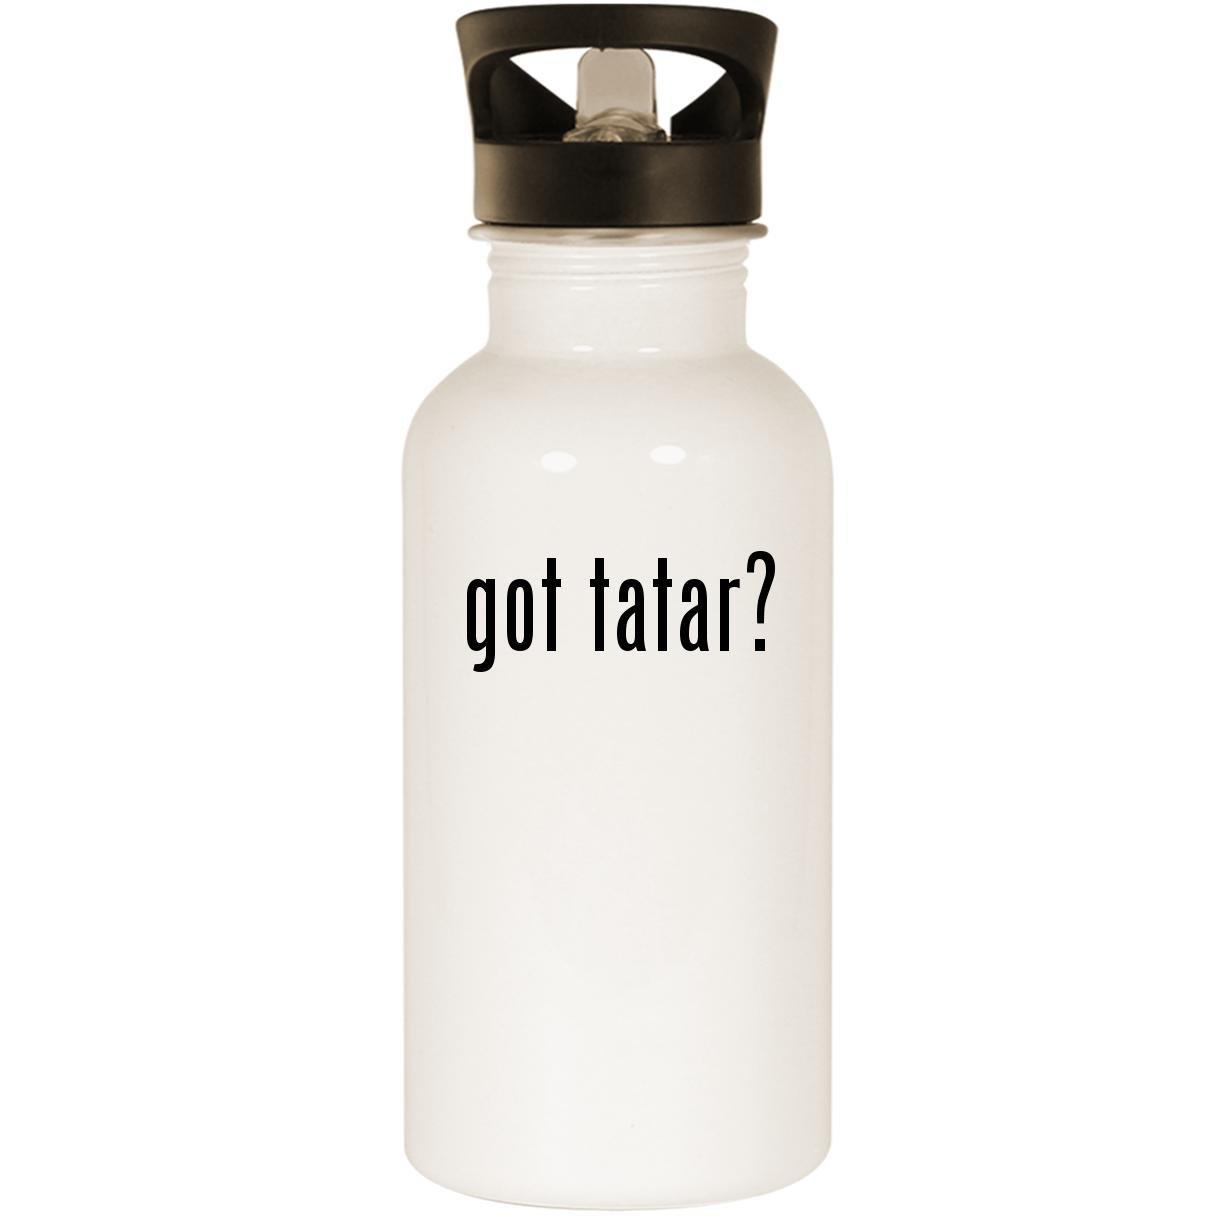 Got Tatar  – ステンレススチール20oz Road Ready水ボトル ホワイト US-C-07-18-01-087451-04-26-19-26 B07FMK41BC ホワイト